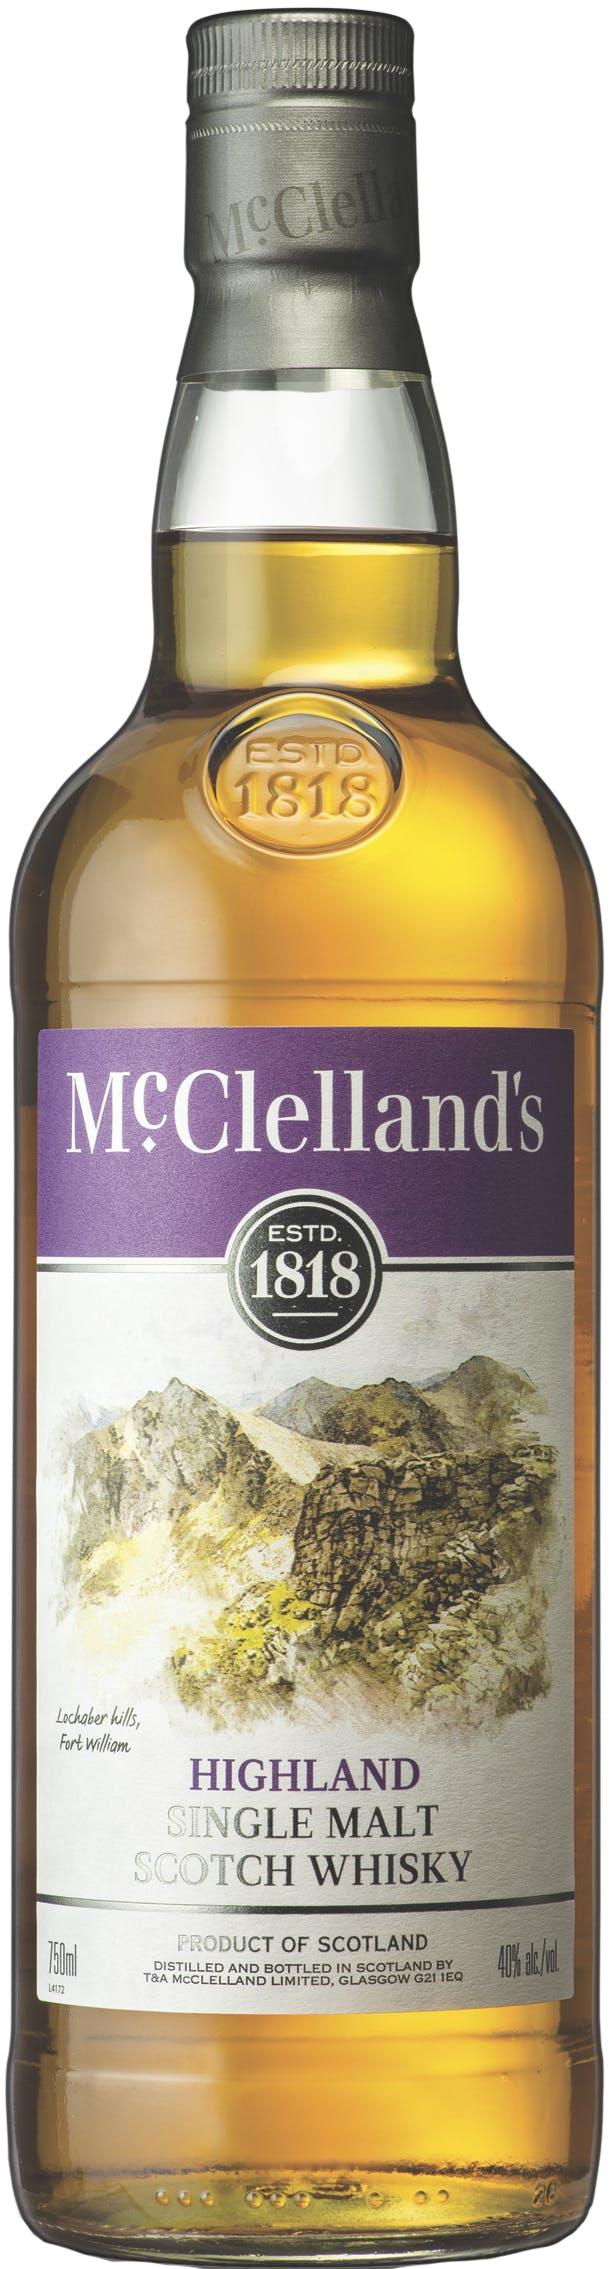 McClellands Highland Single Malt Scotch Whisky - Stirling